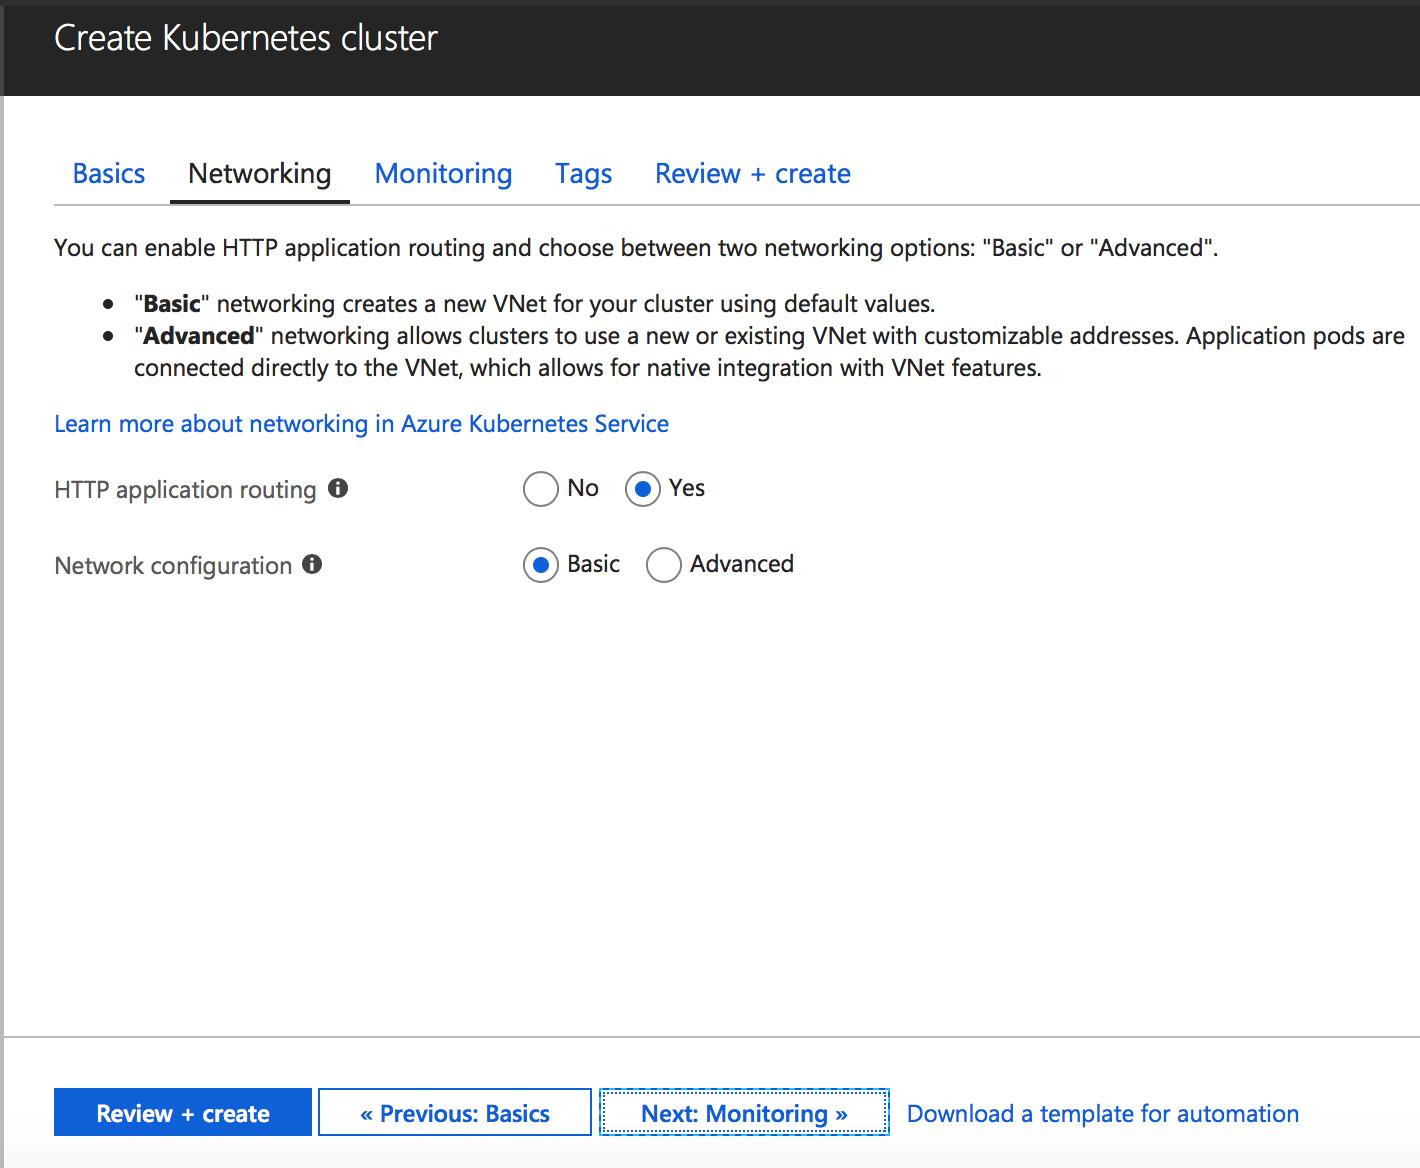 Microsoft Azure Deployment